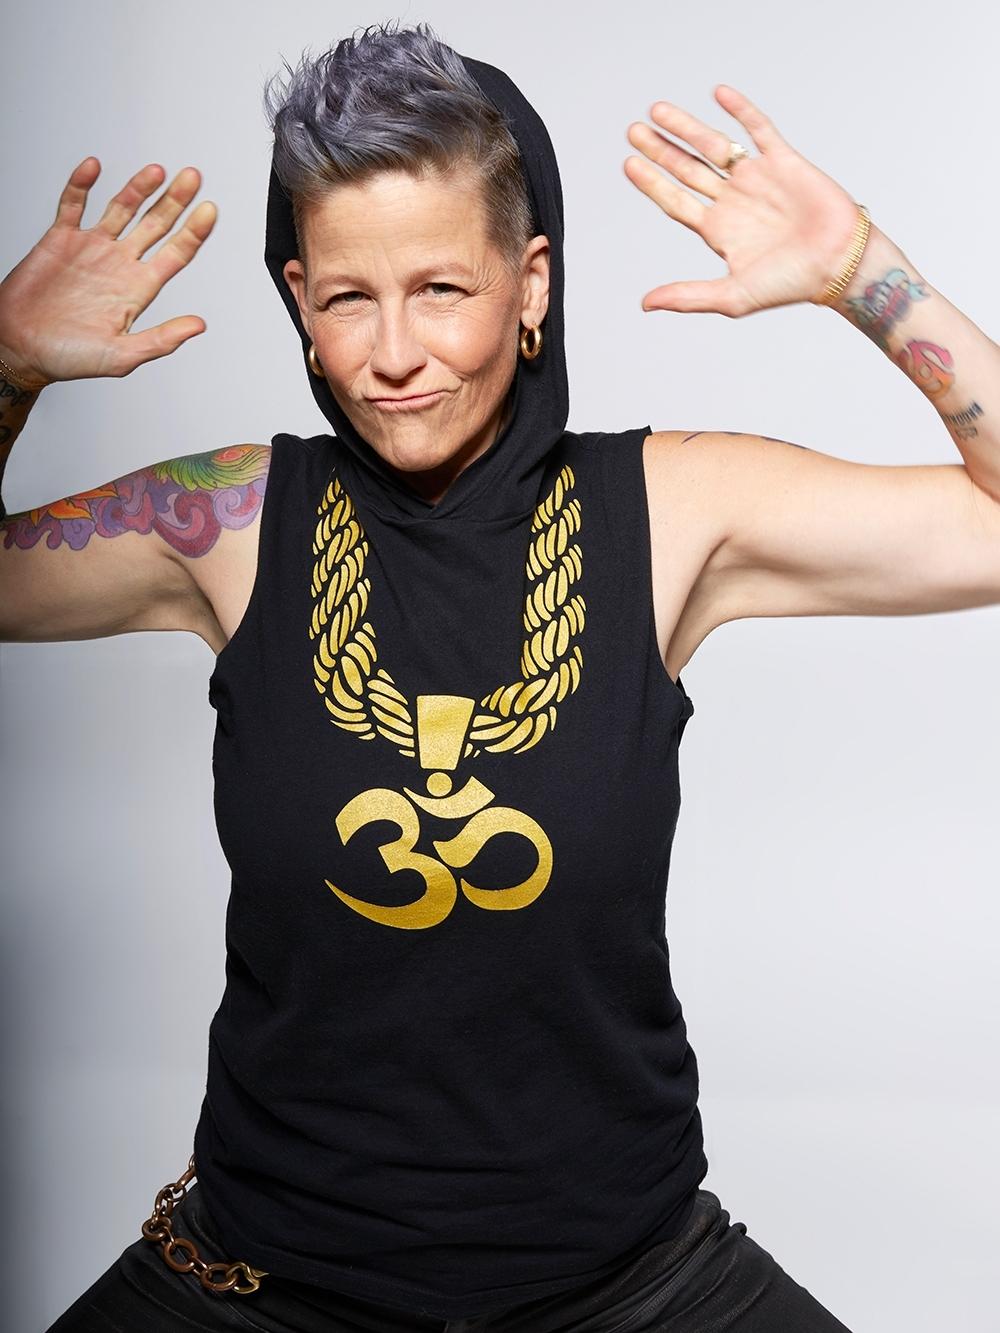 Dana Flynn - founder Laughing Lotus